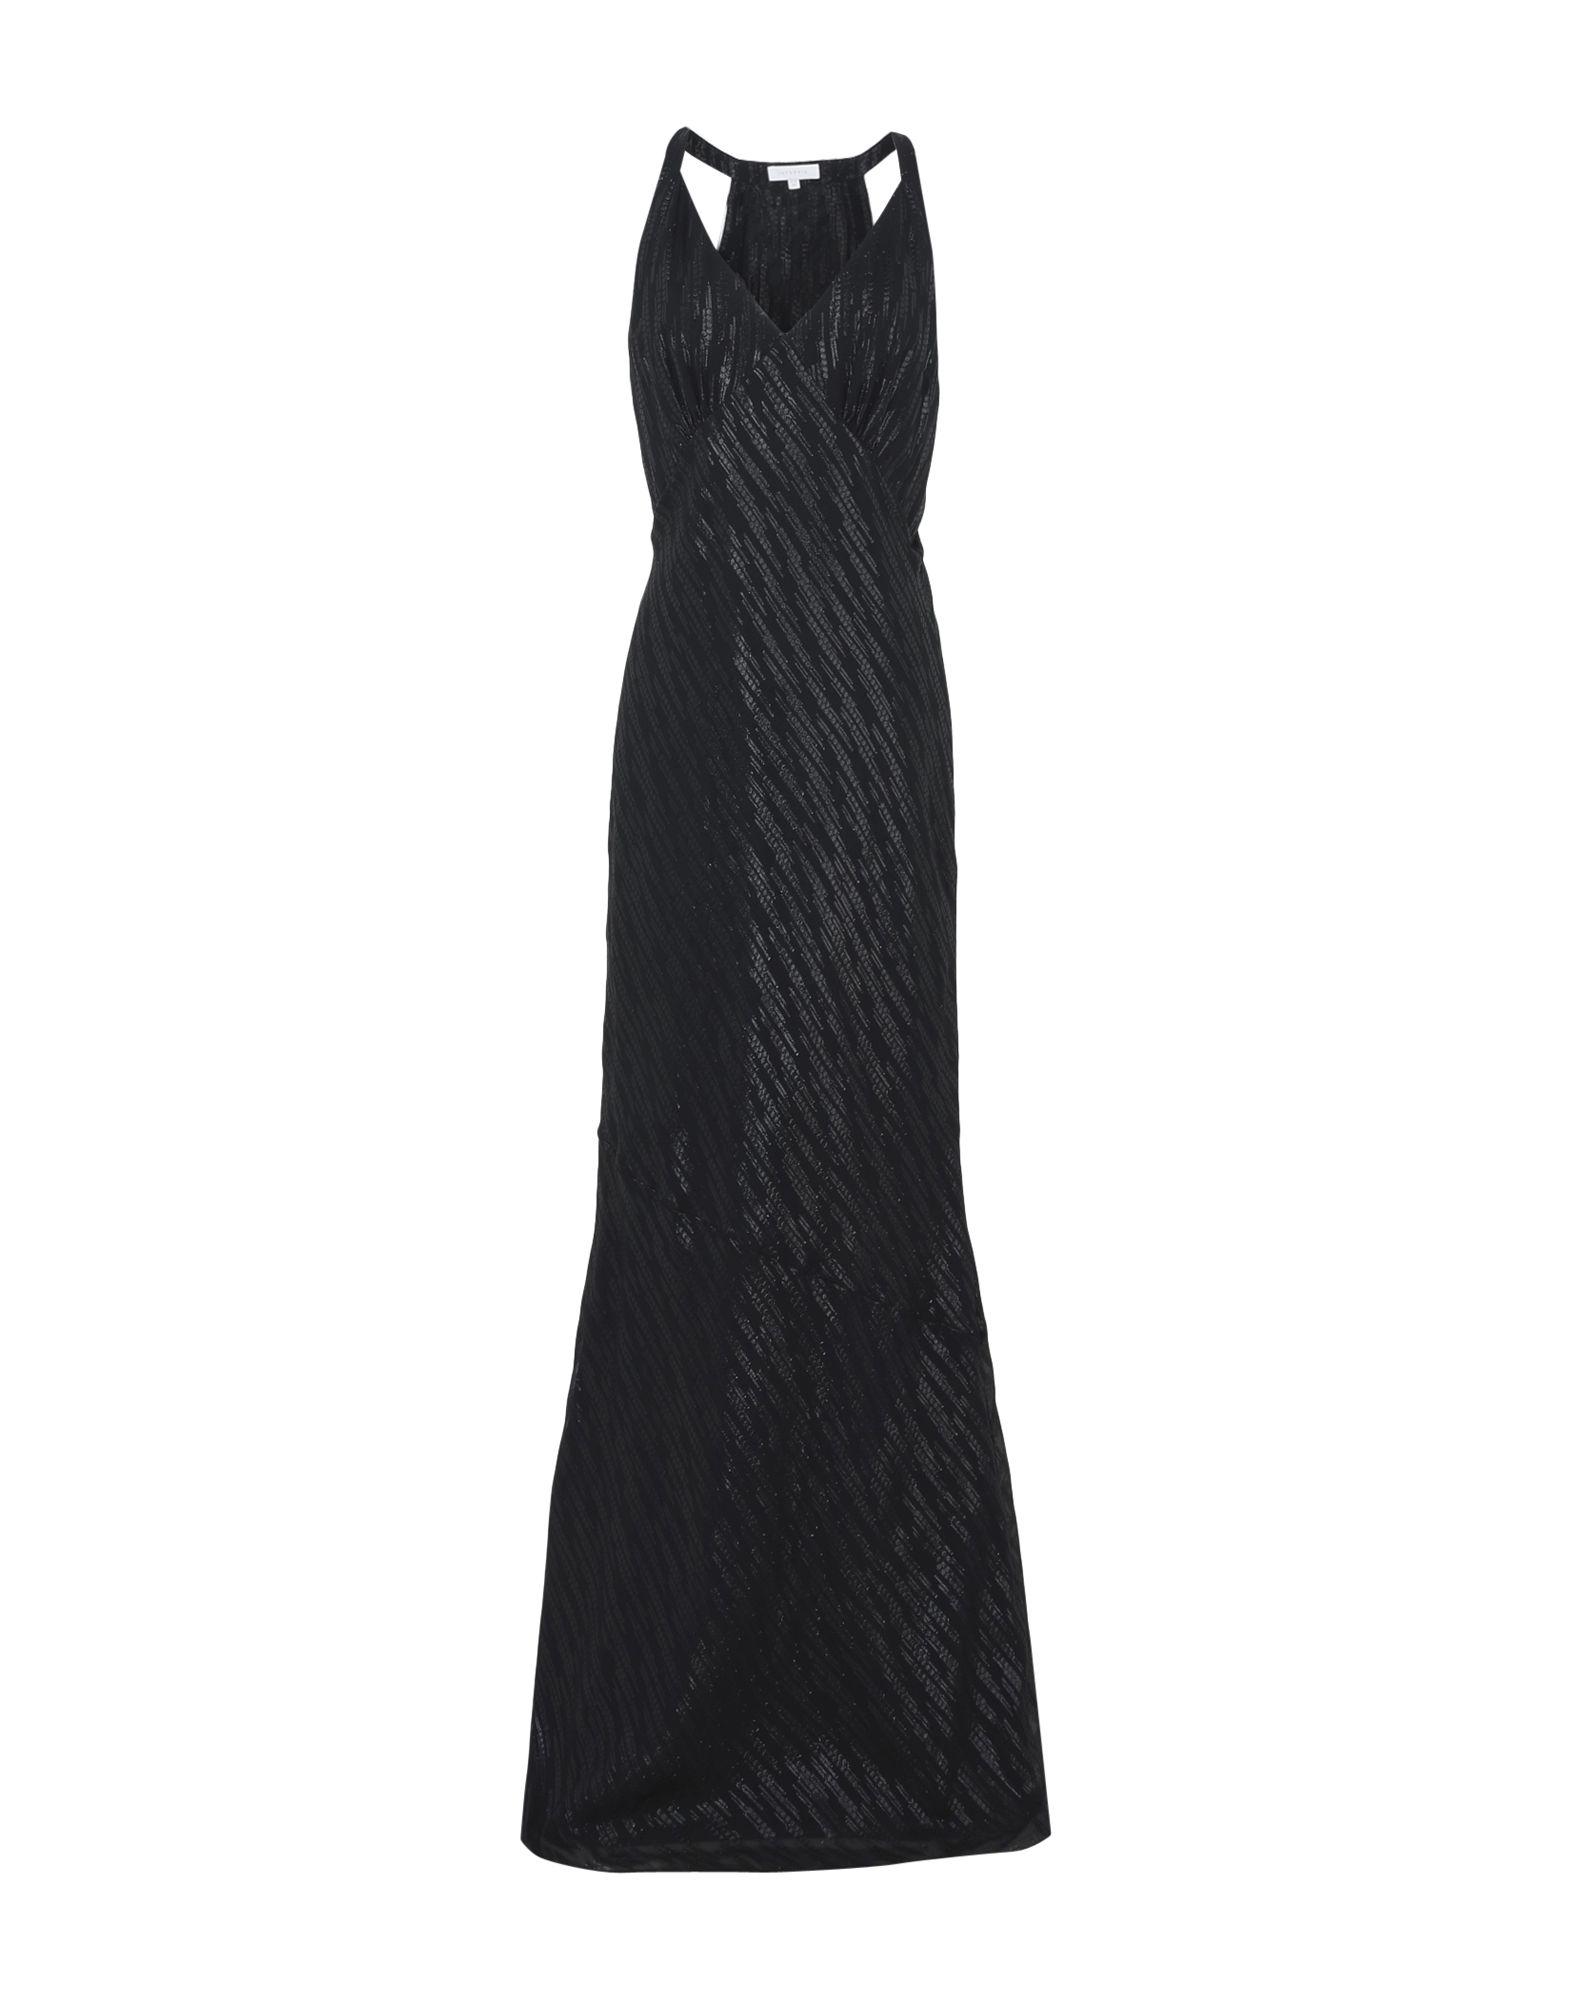 INTROPIA Long Dress in Black